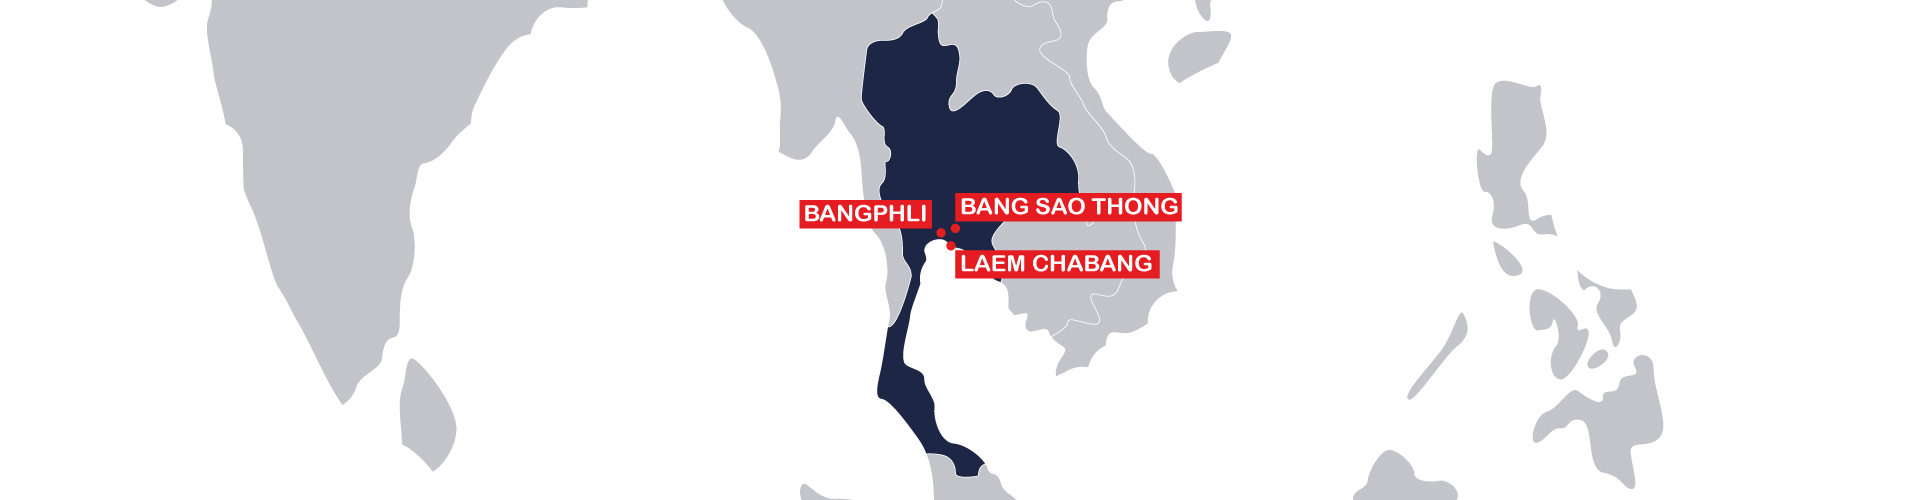 MAP THAILAND EN.jpg